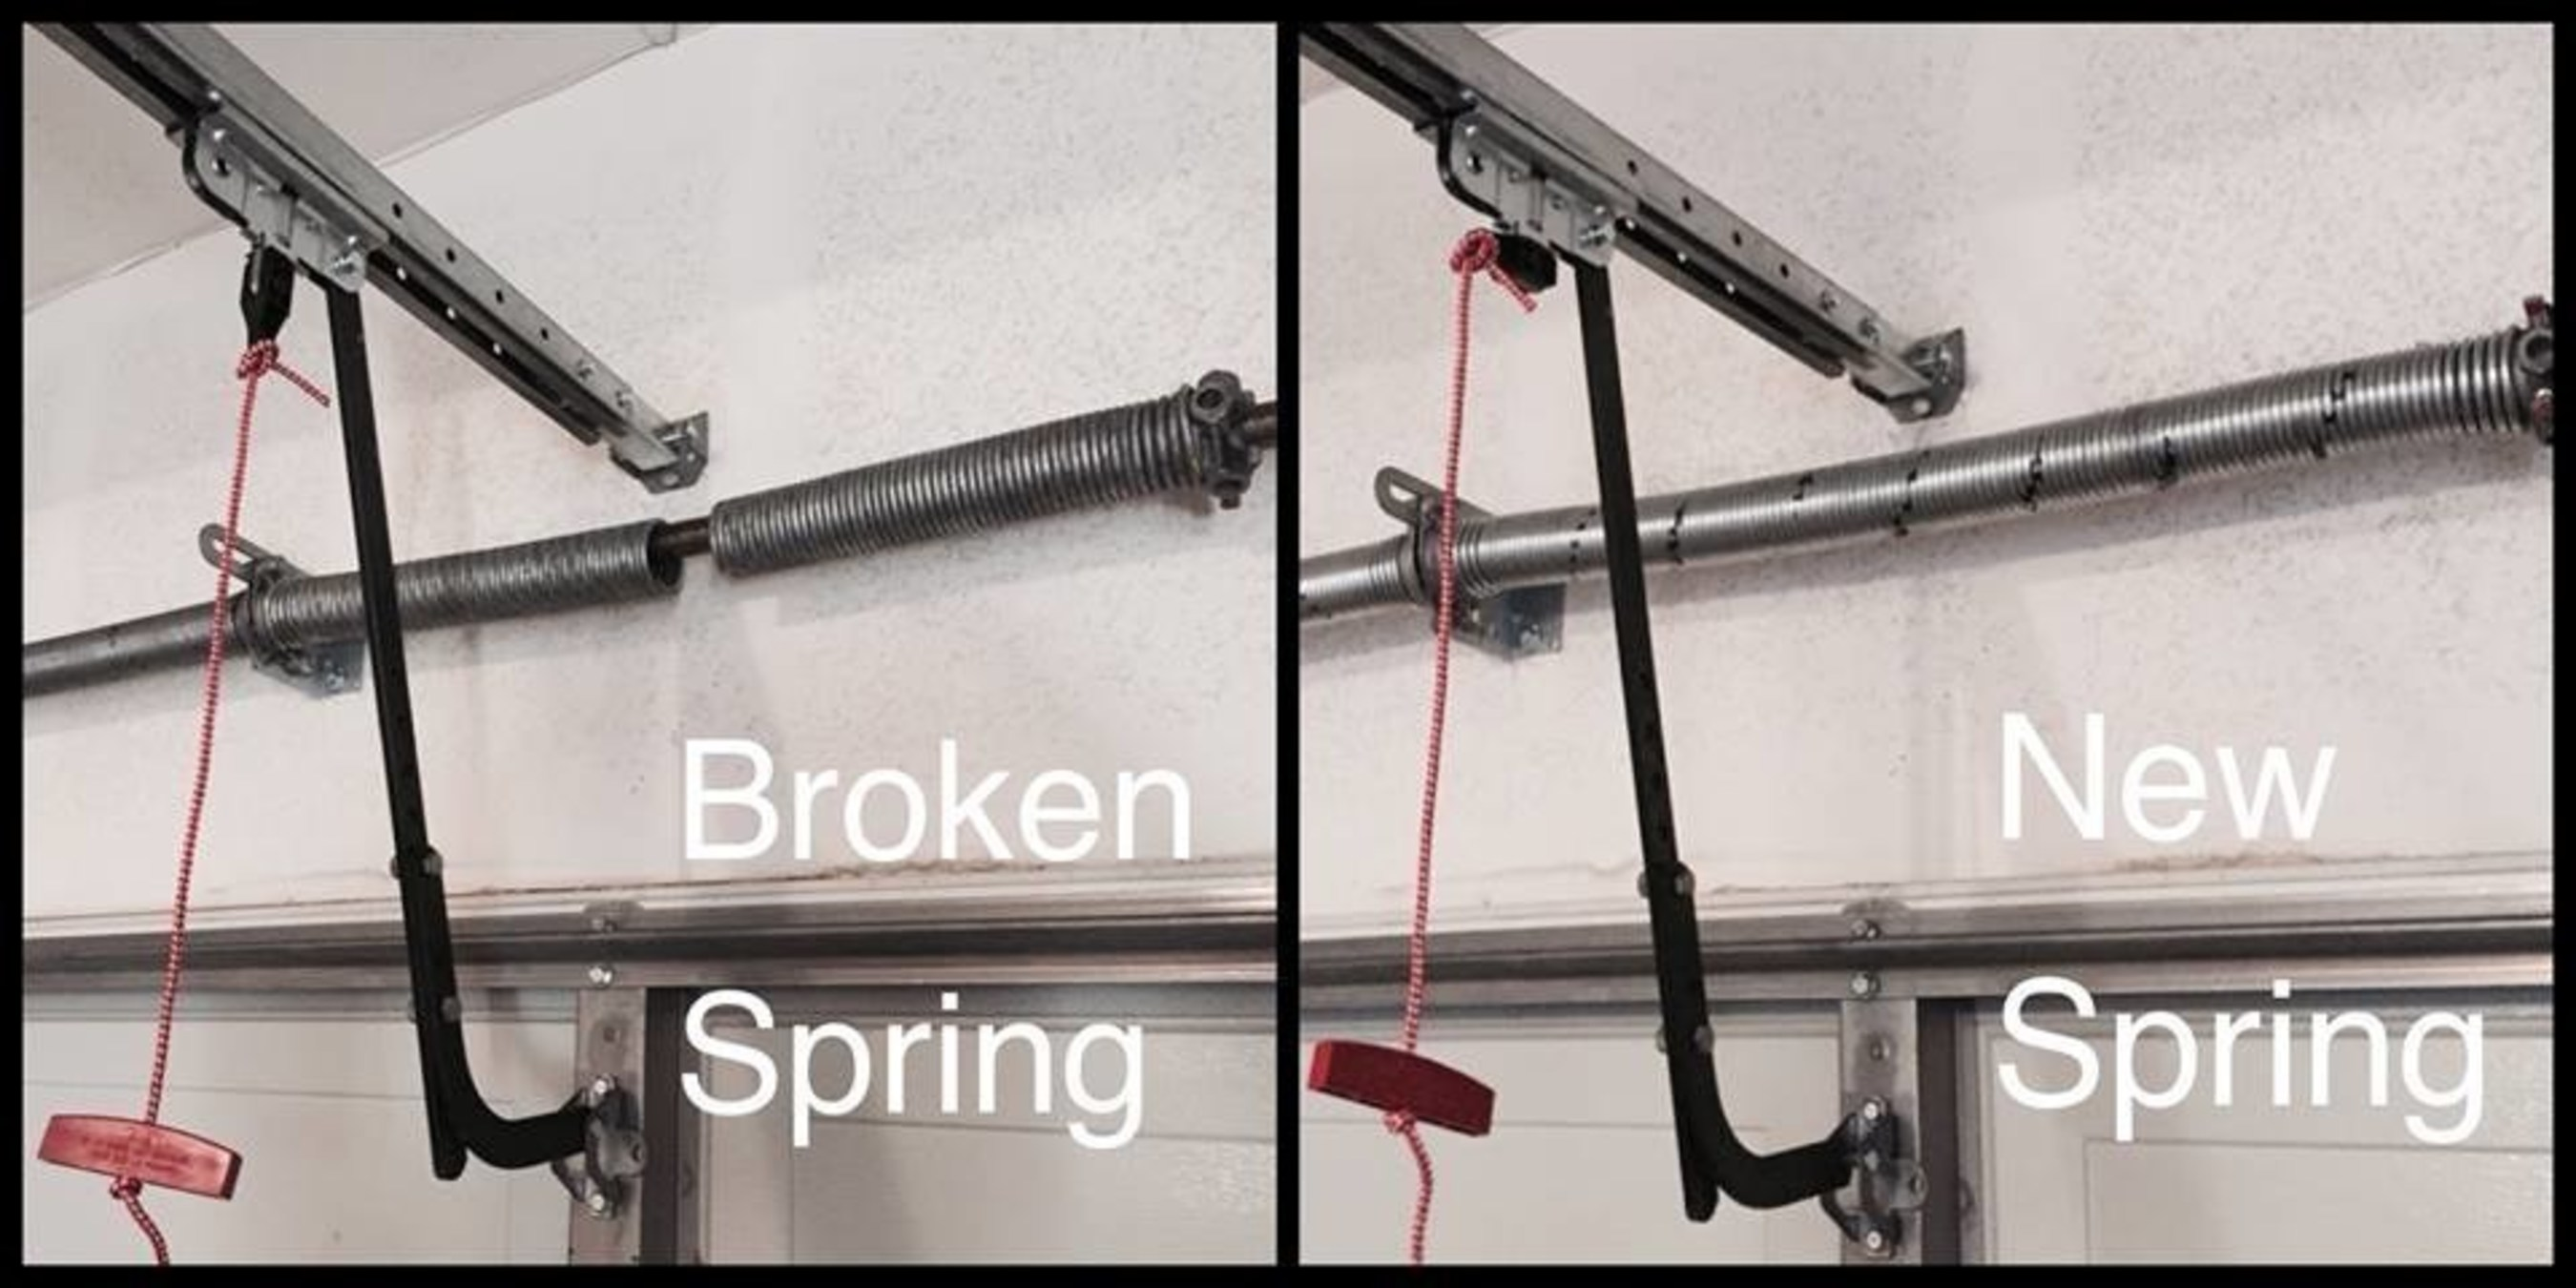 Rockstar Garage Door Services Handles All Broken Spring Repairs